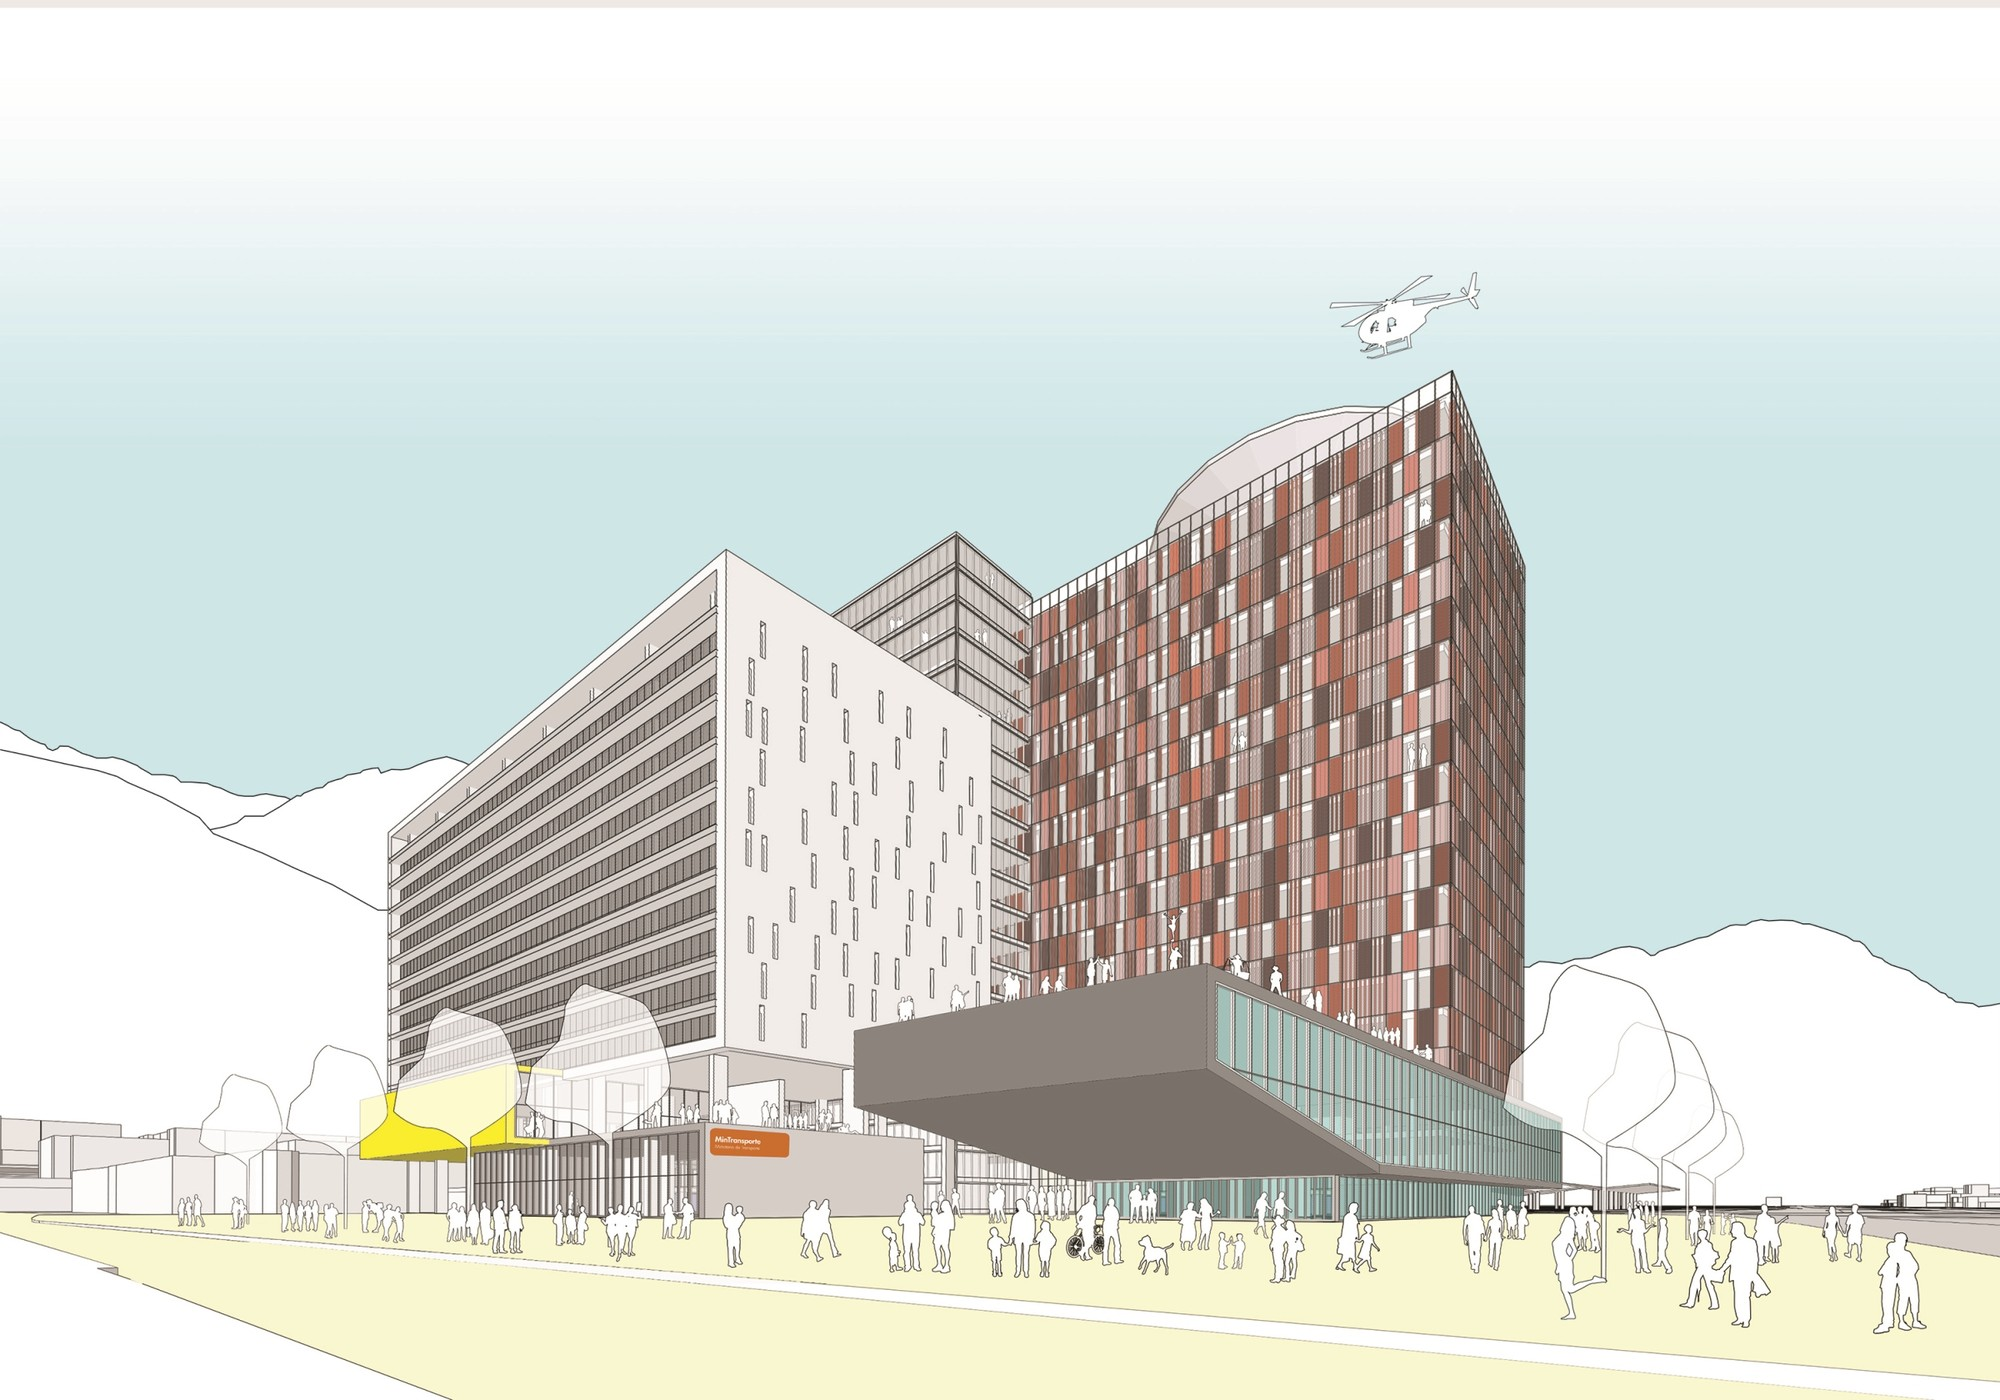 Segundo lugar en concurso público de Ideas – Proyecto Ministerios / Colombia, Courtesy of JAC Arquitectos